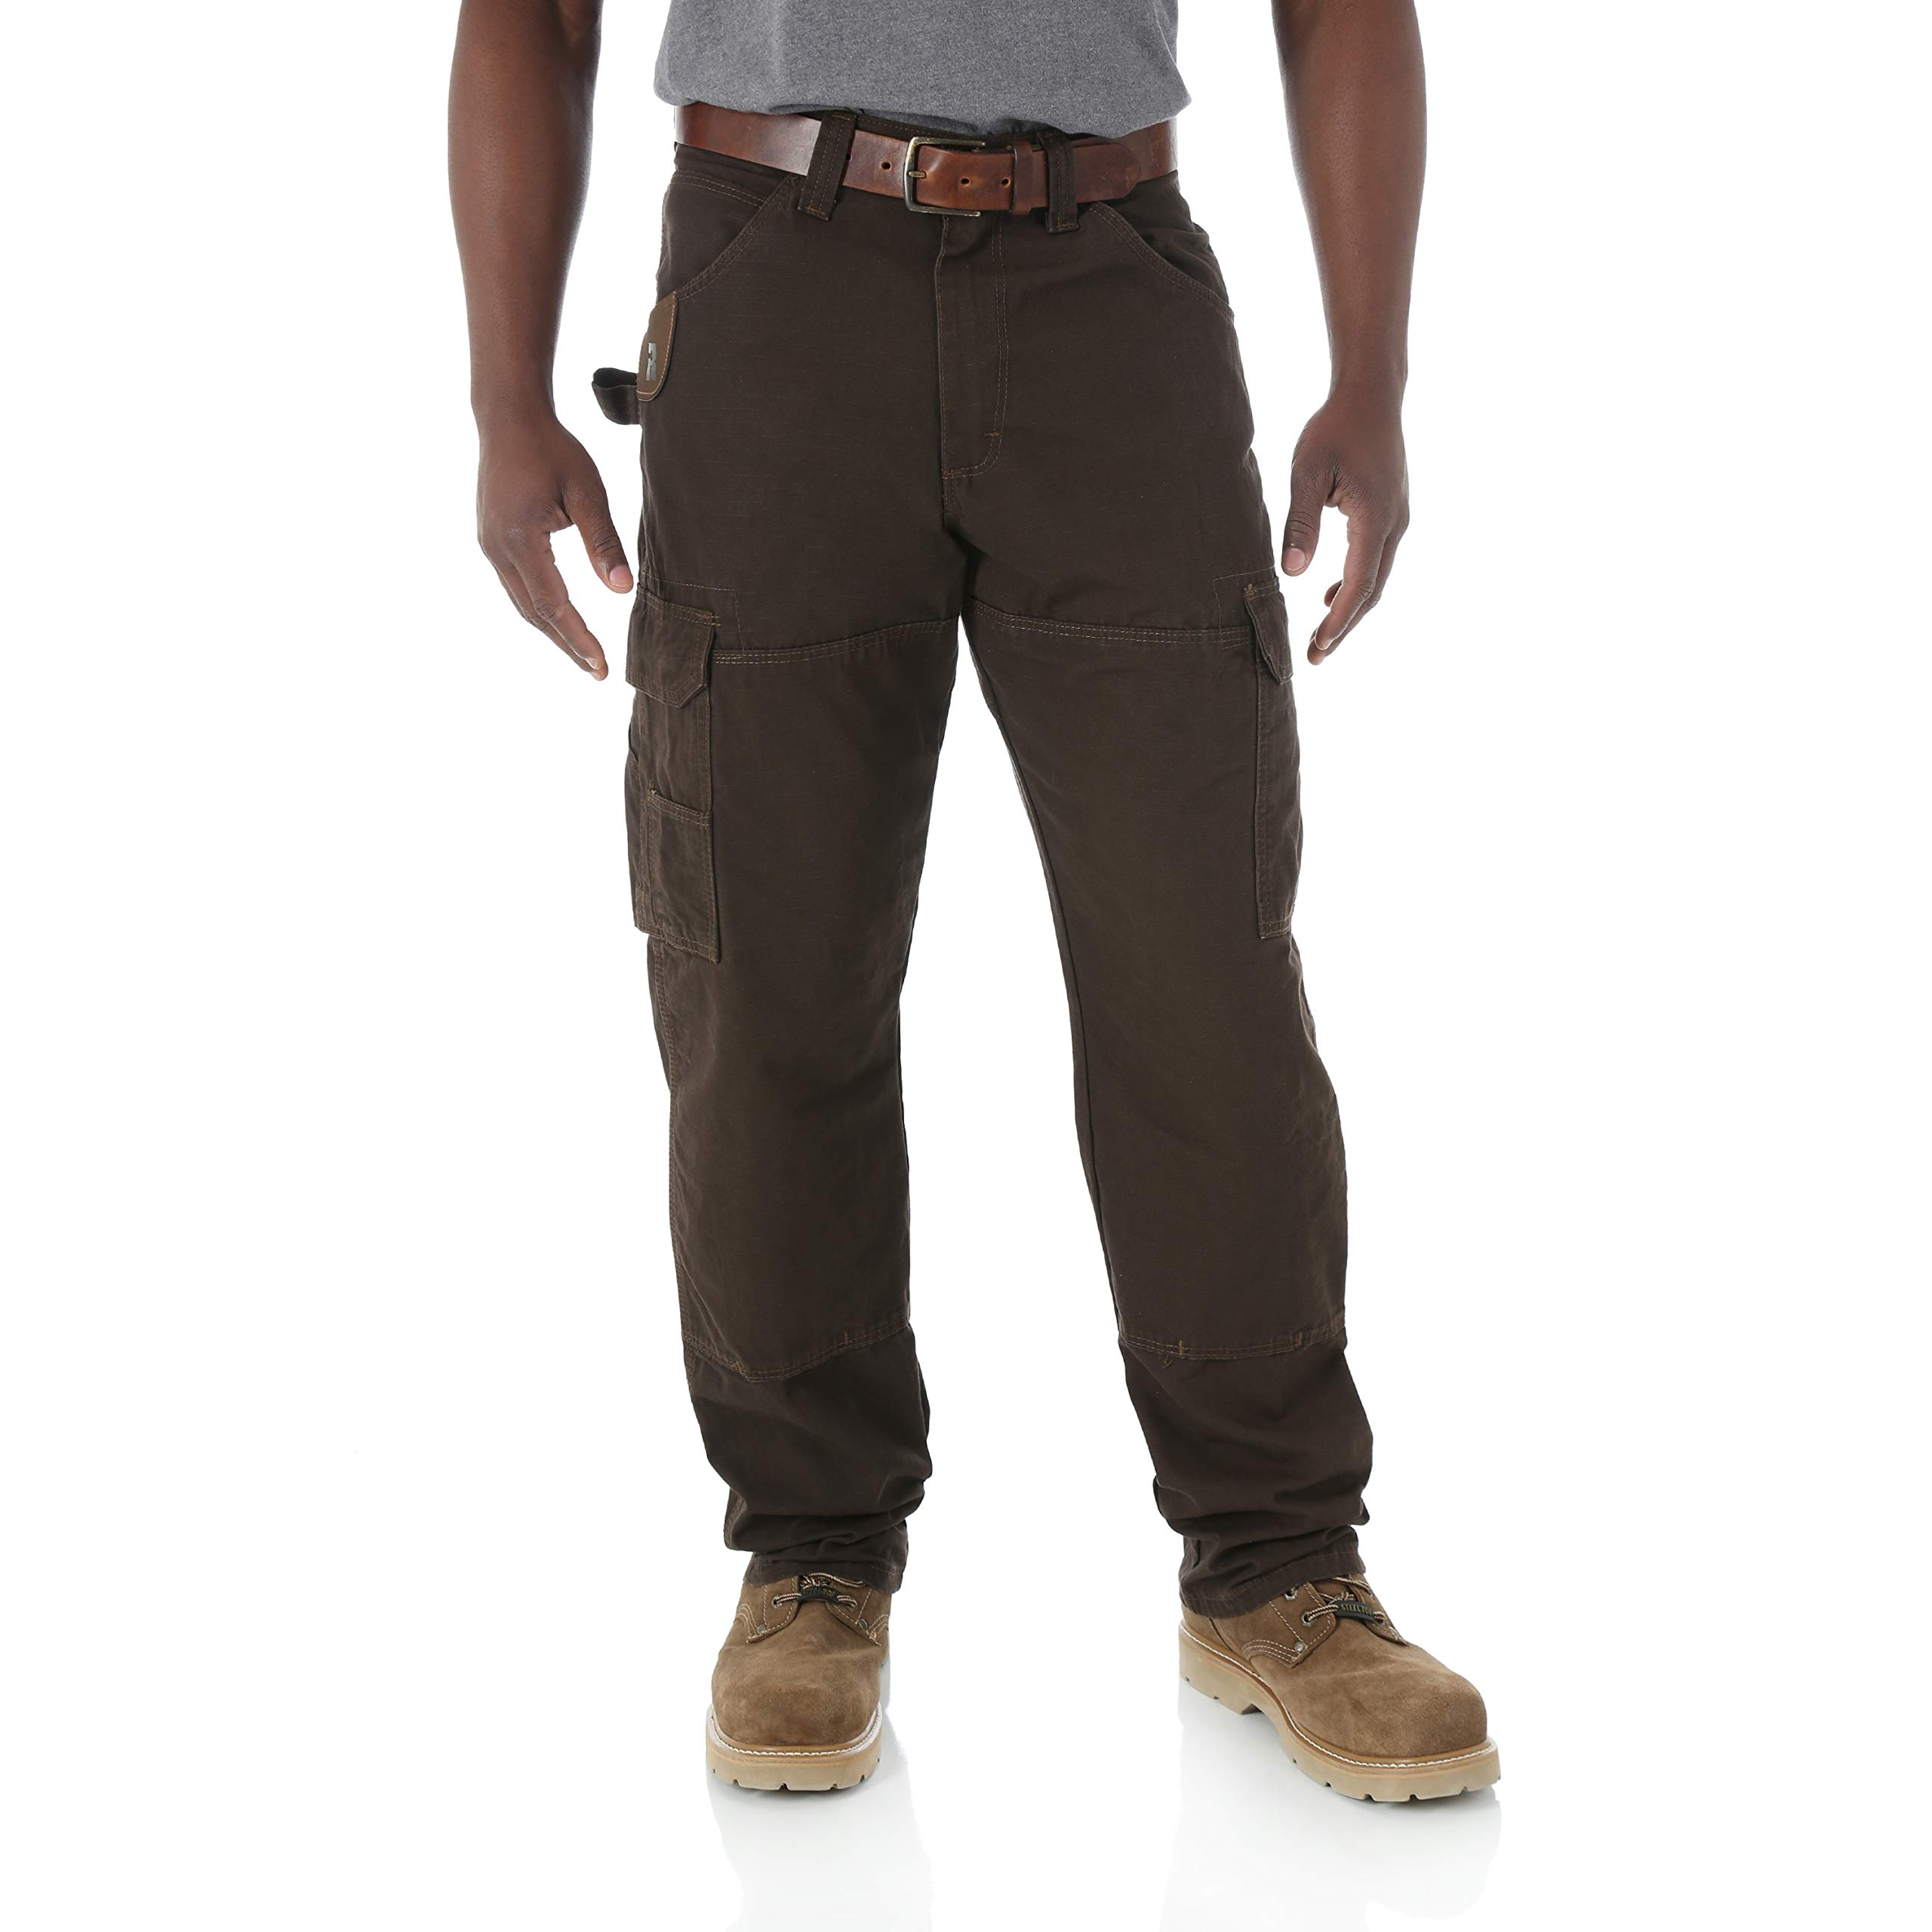 Wrangler Riggs Workwear Men's Ranger Pant,Dark Brown,36x32 by Wrangler Riggs Workwear